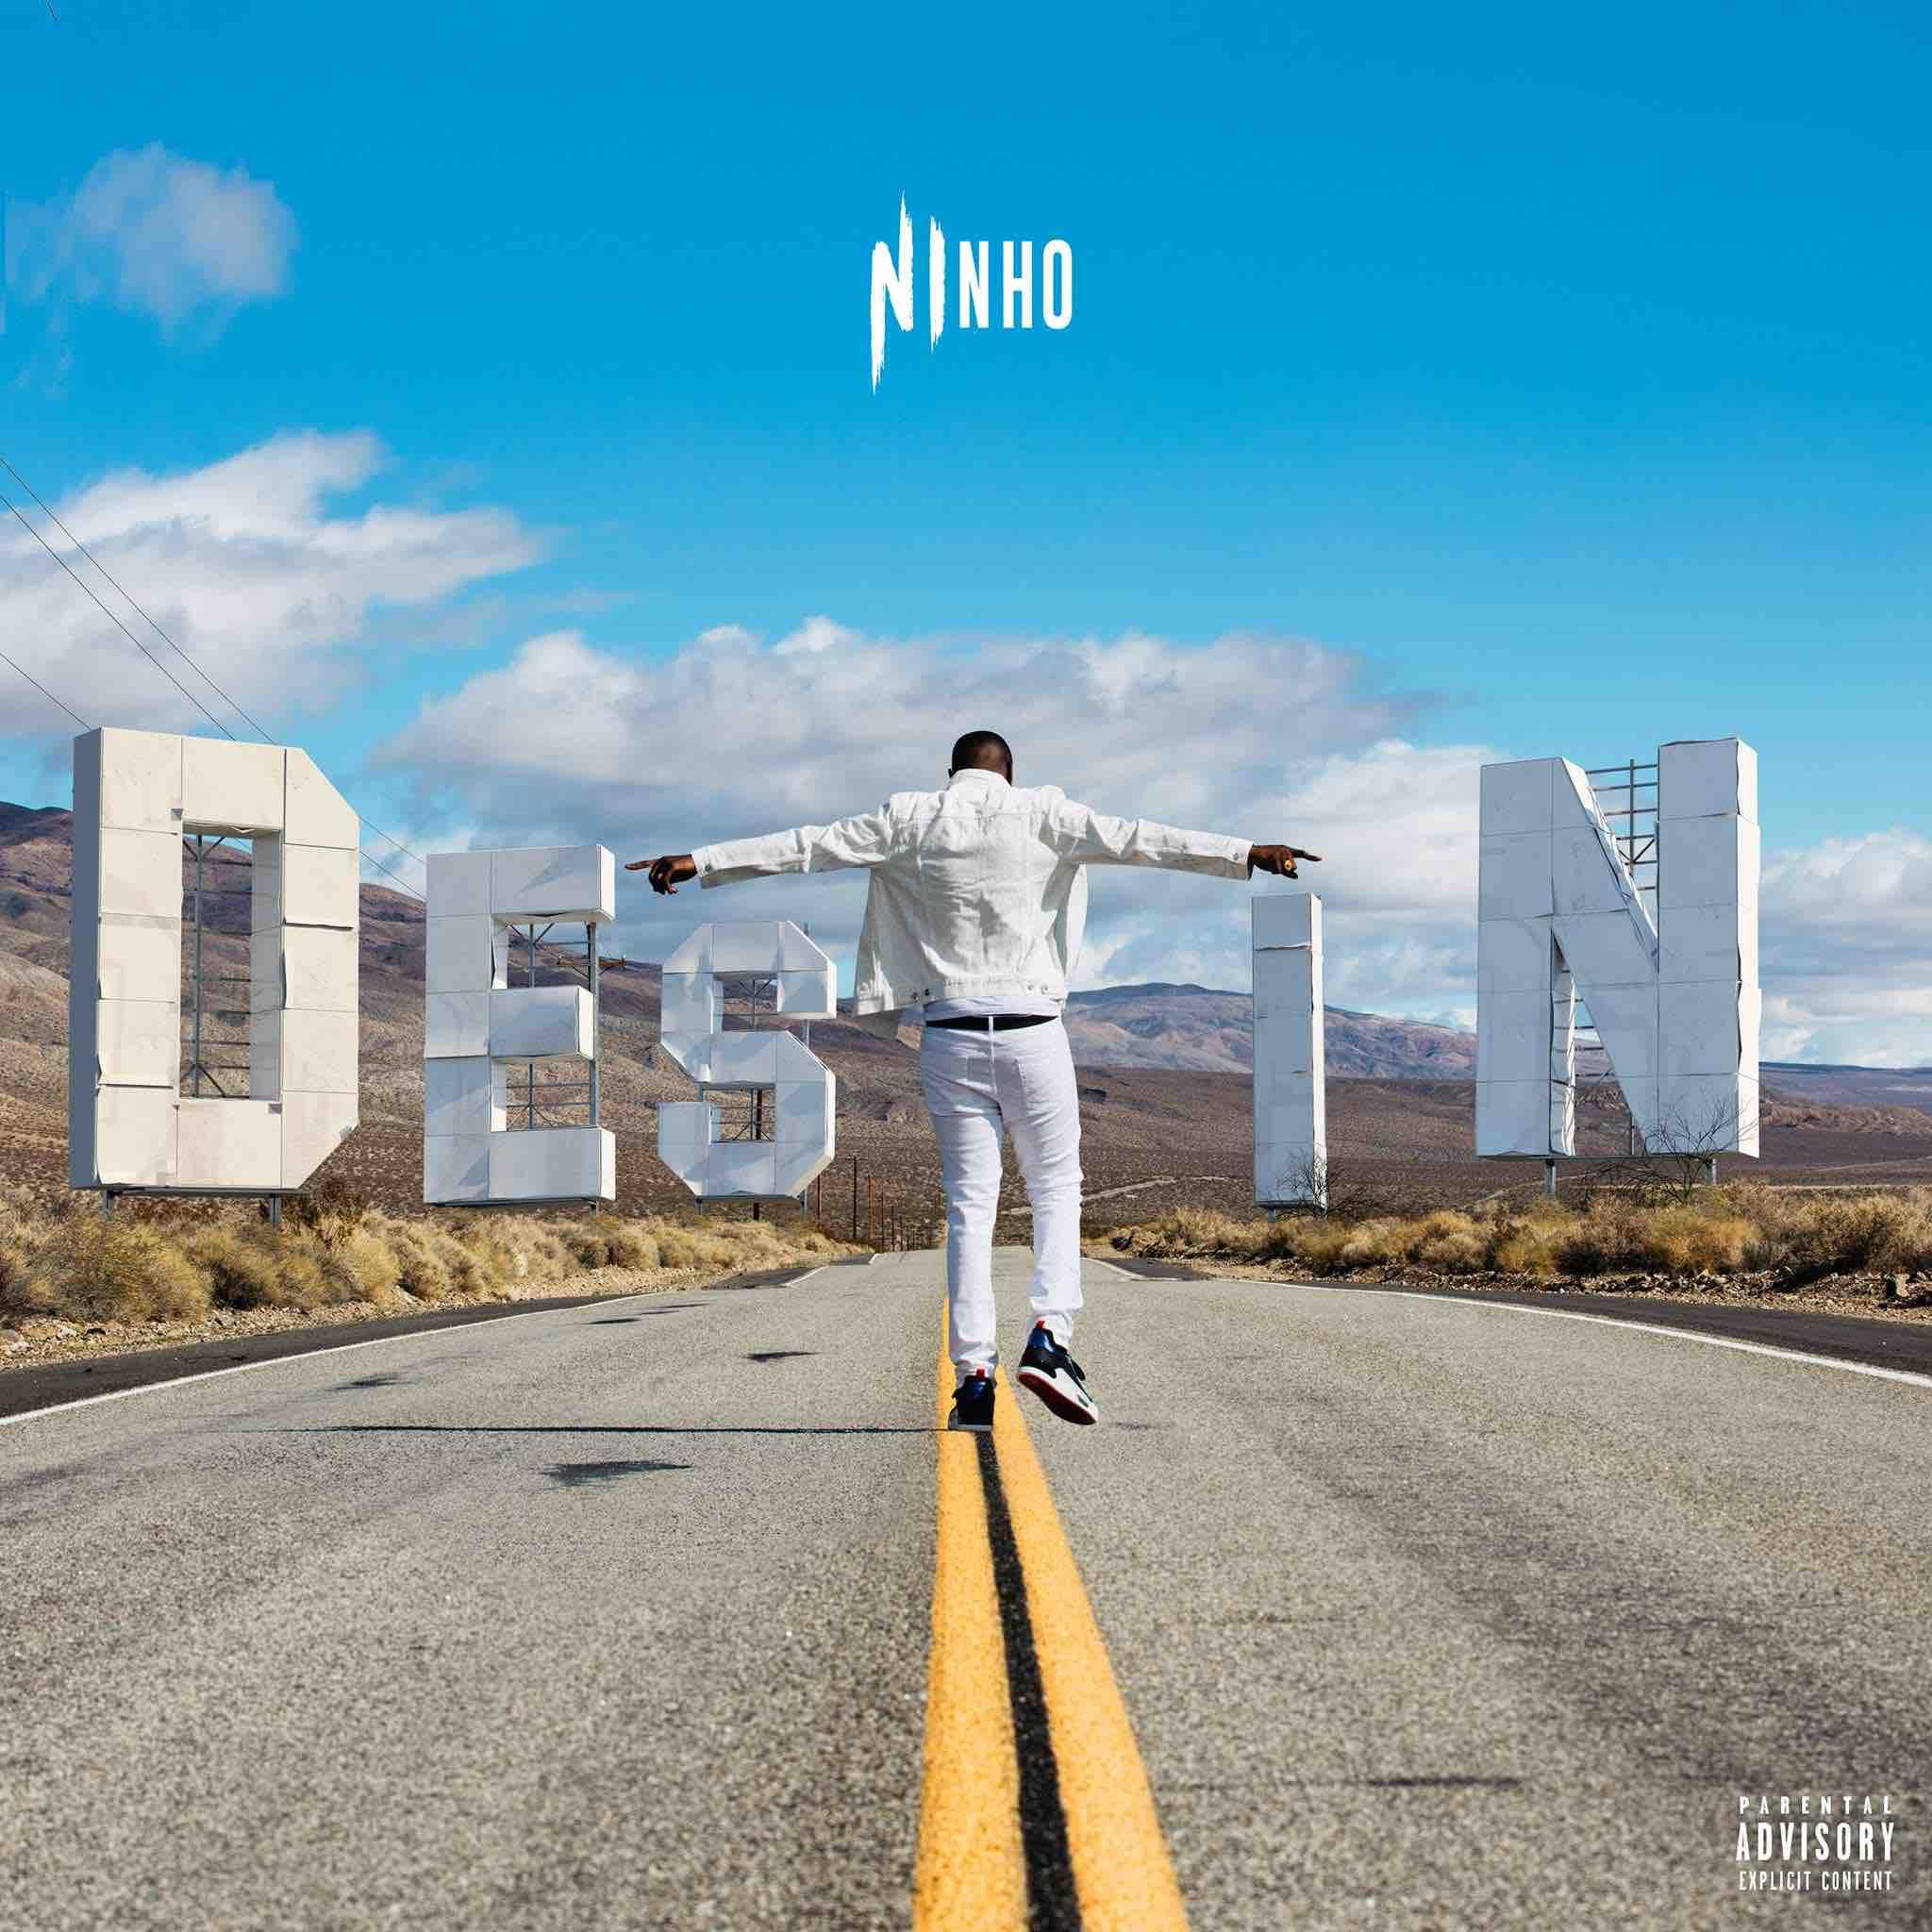 Ninho - Destin - records - streamings